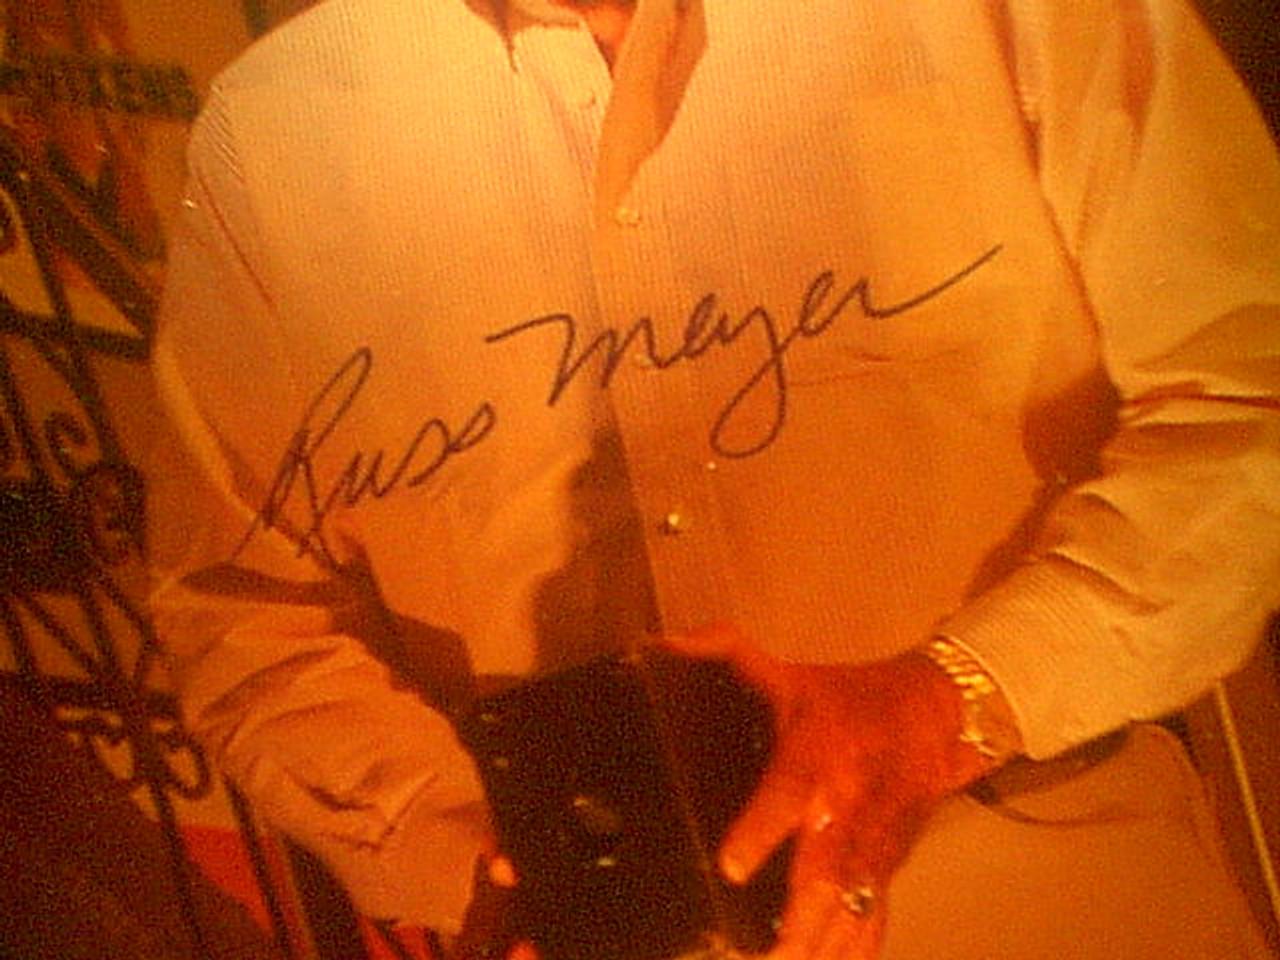 Meyer, Russ Color Photo Signed Autograph